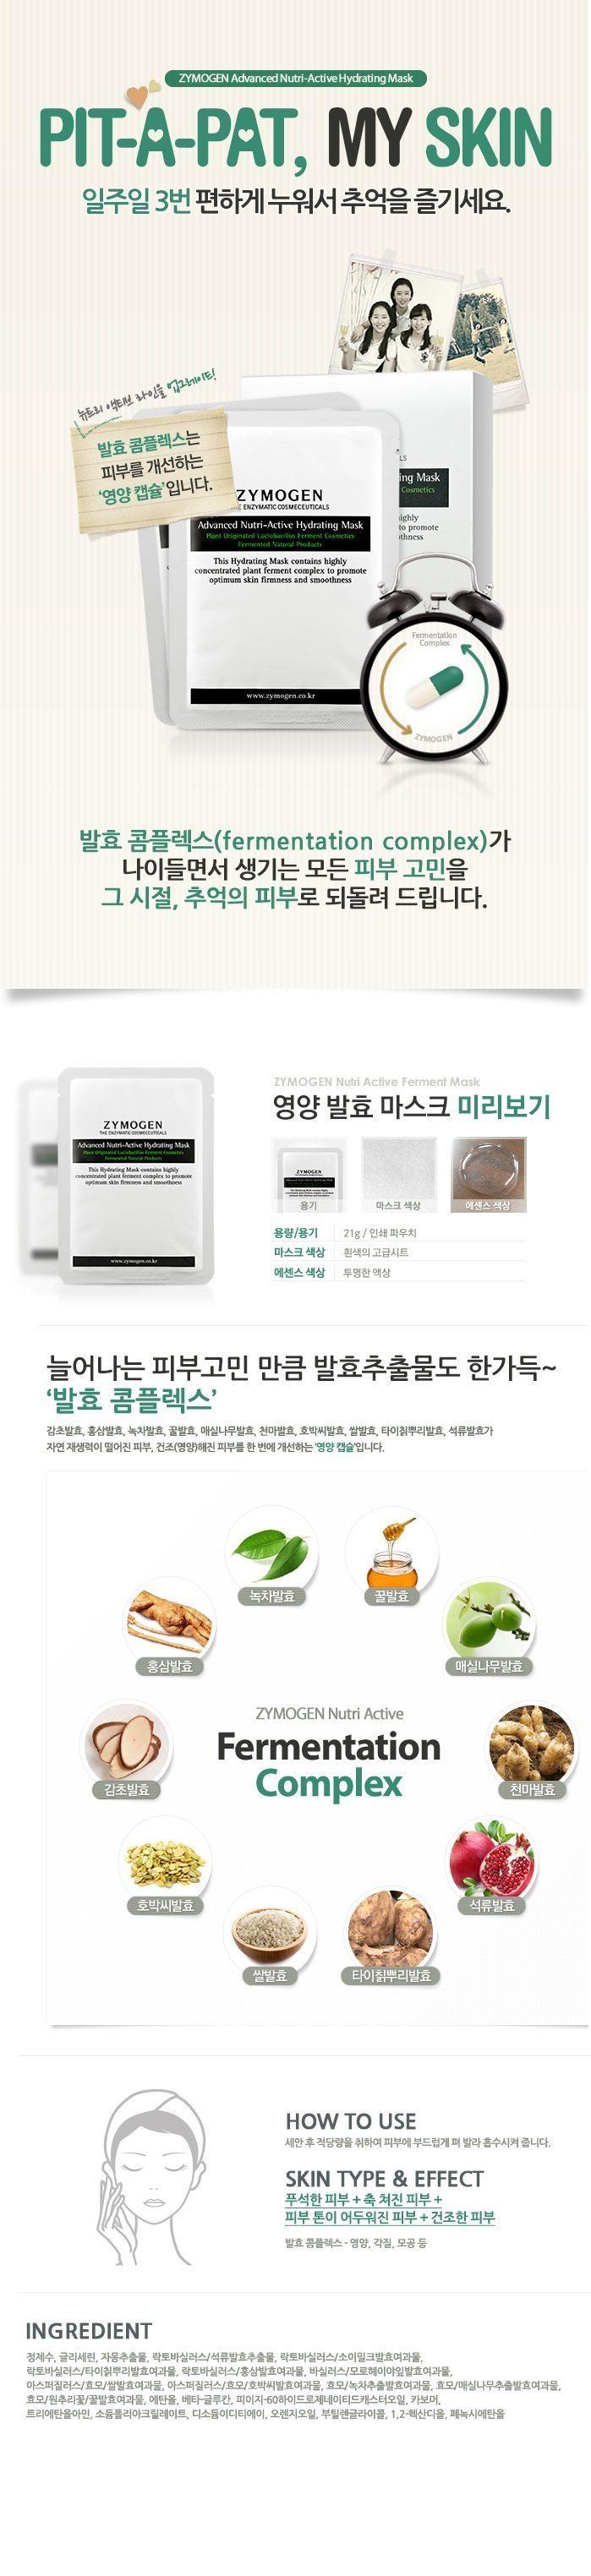 Zymogen Advanced Nutri Active Hydrating Mask korean cosmetic skincar product online shop malaysia brazil macau1